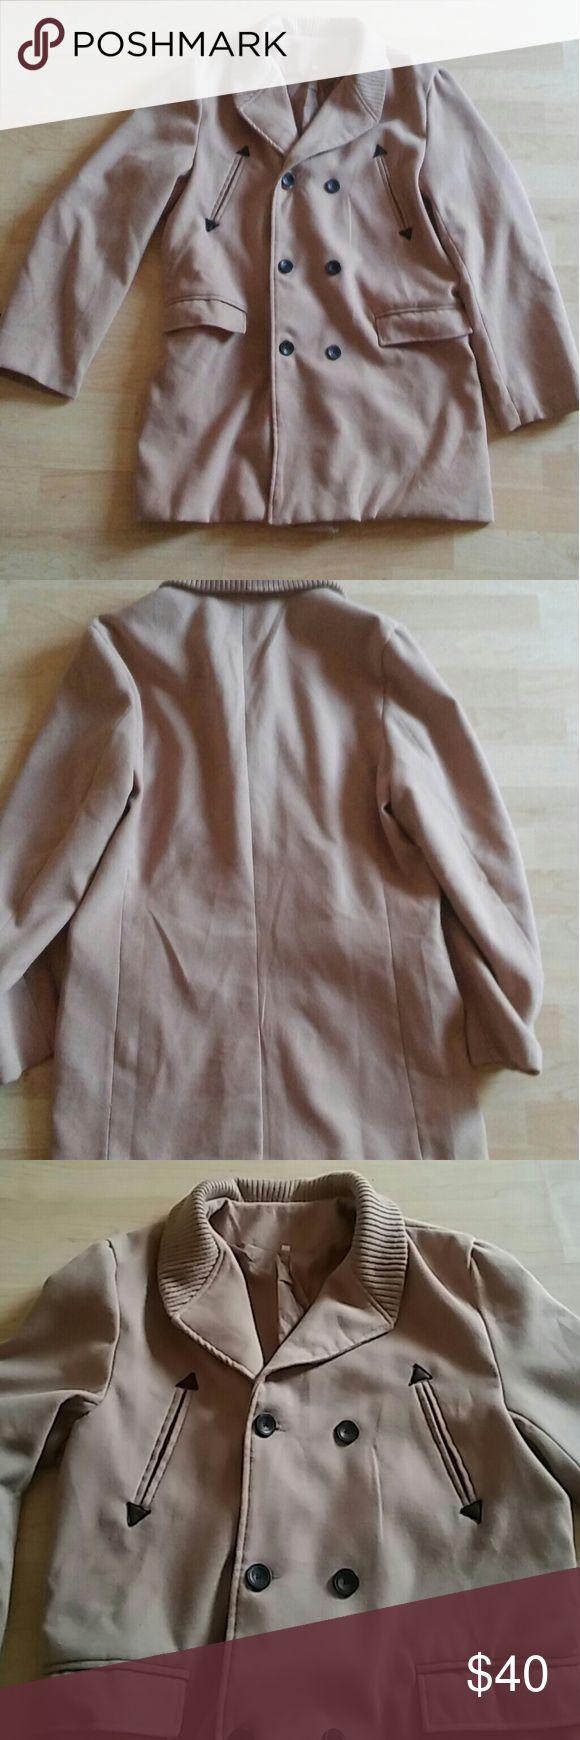 Men's Wool Blend Peacoat Unbranded XXL Tan. XXL. Great condition. No damage. Lightweight Jackets & Coats Pea Coats